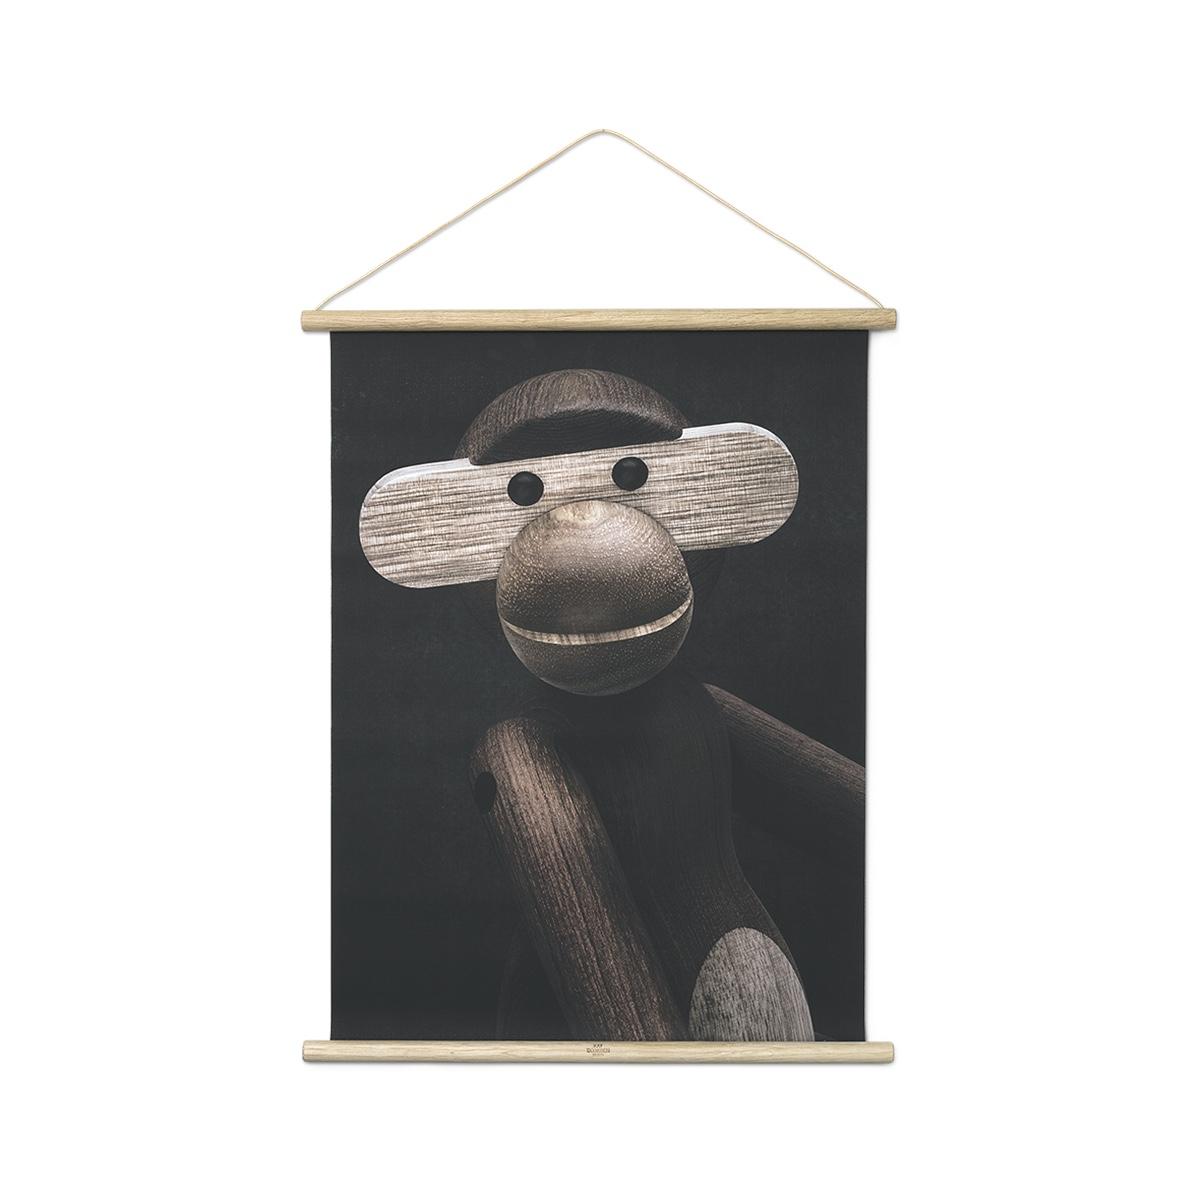 Monkey photo portrait